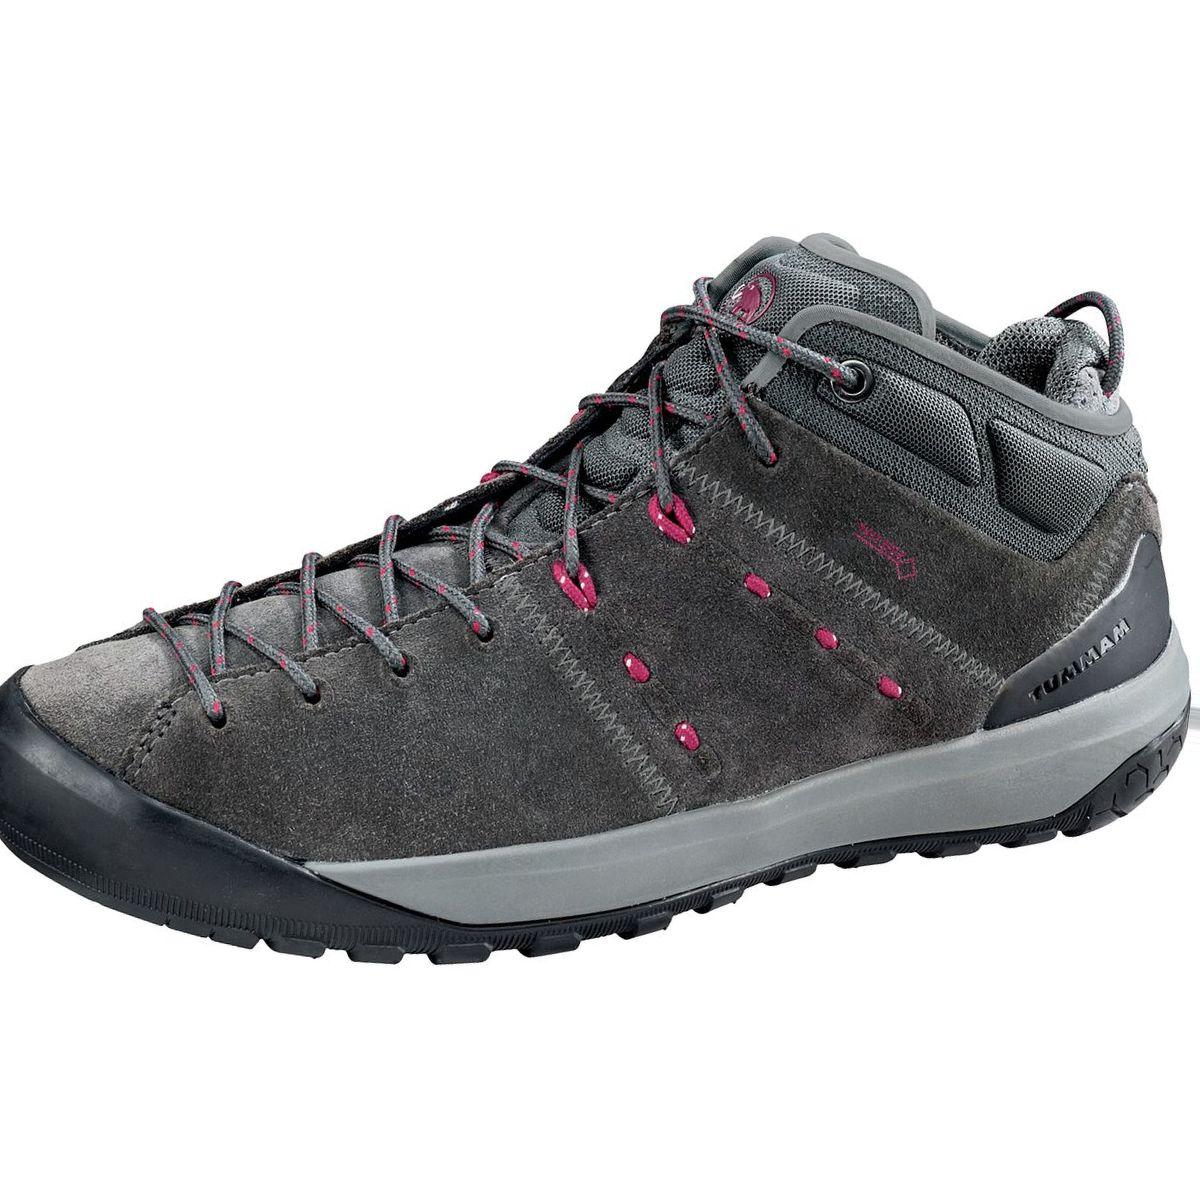 Mammut Hueco Mid GTX Shoe - Women's